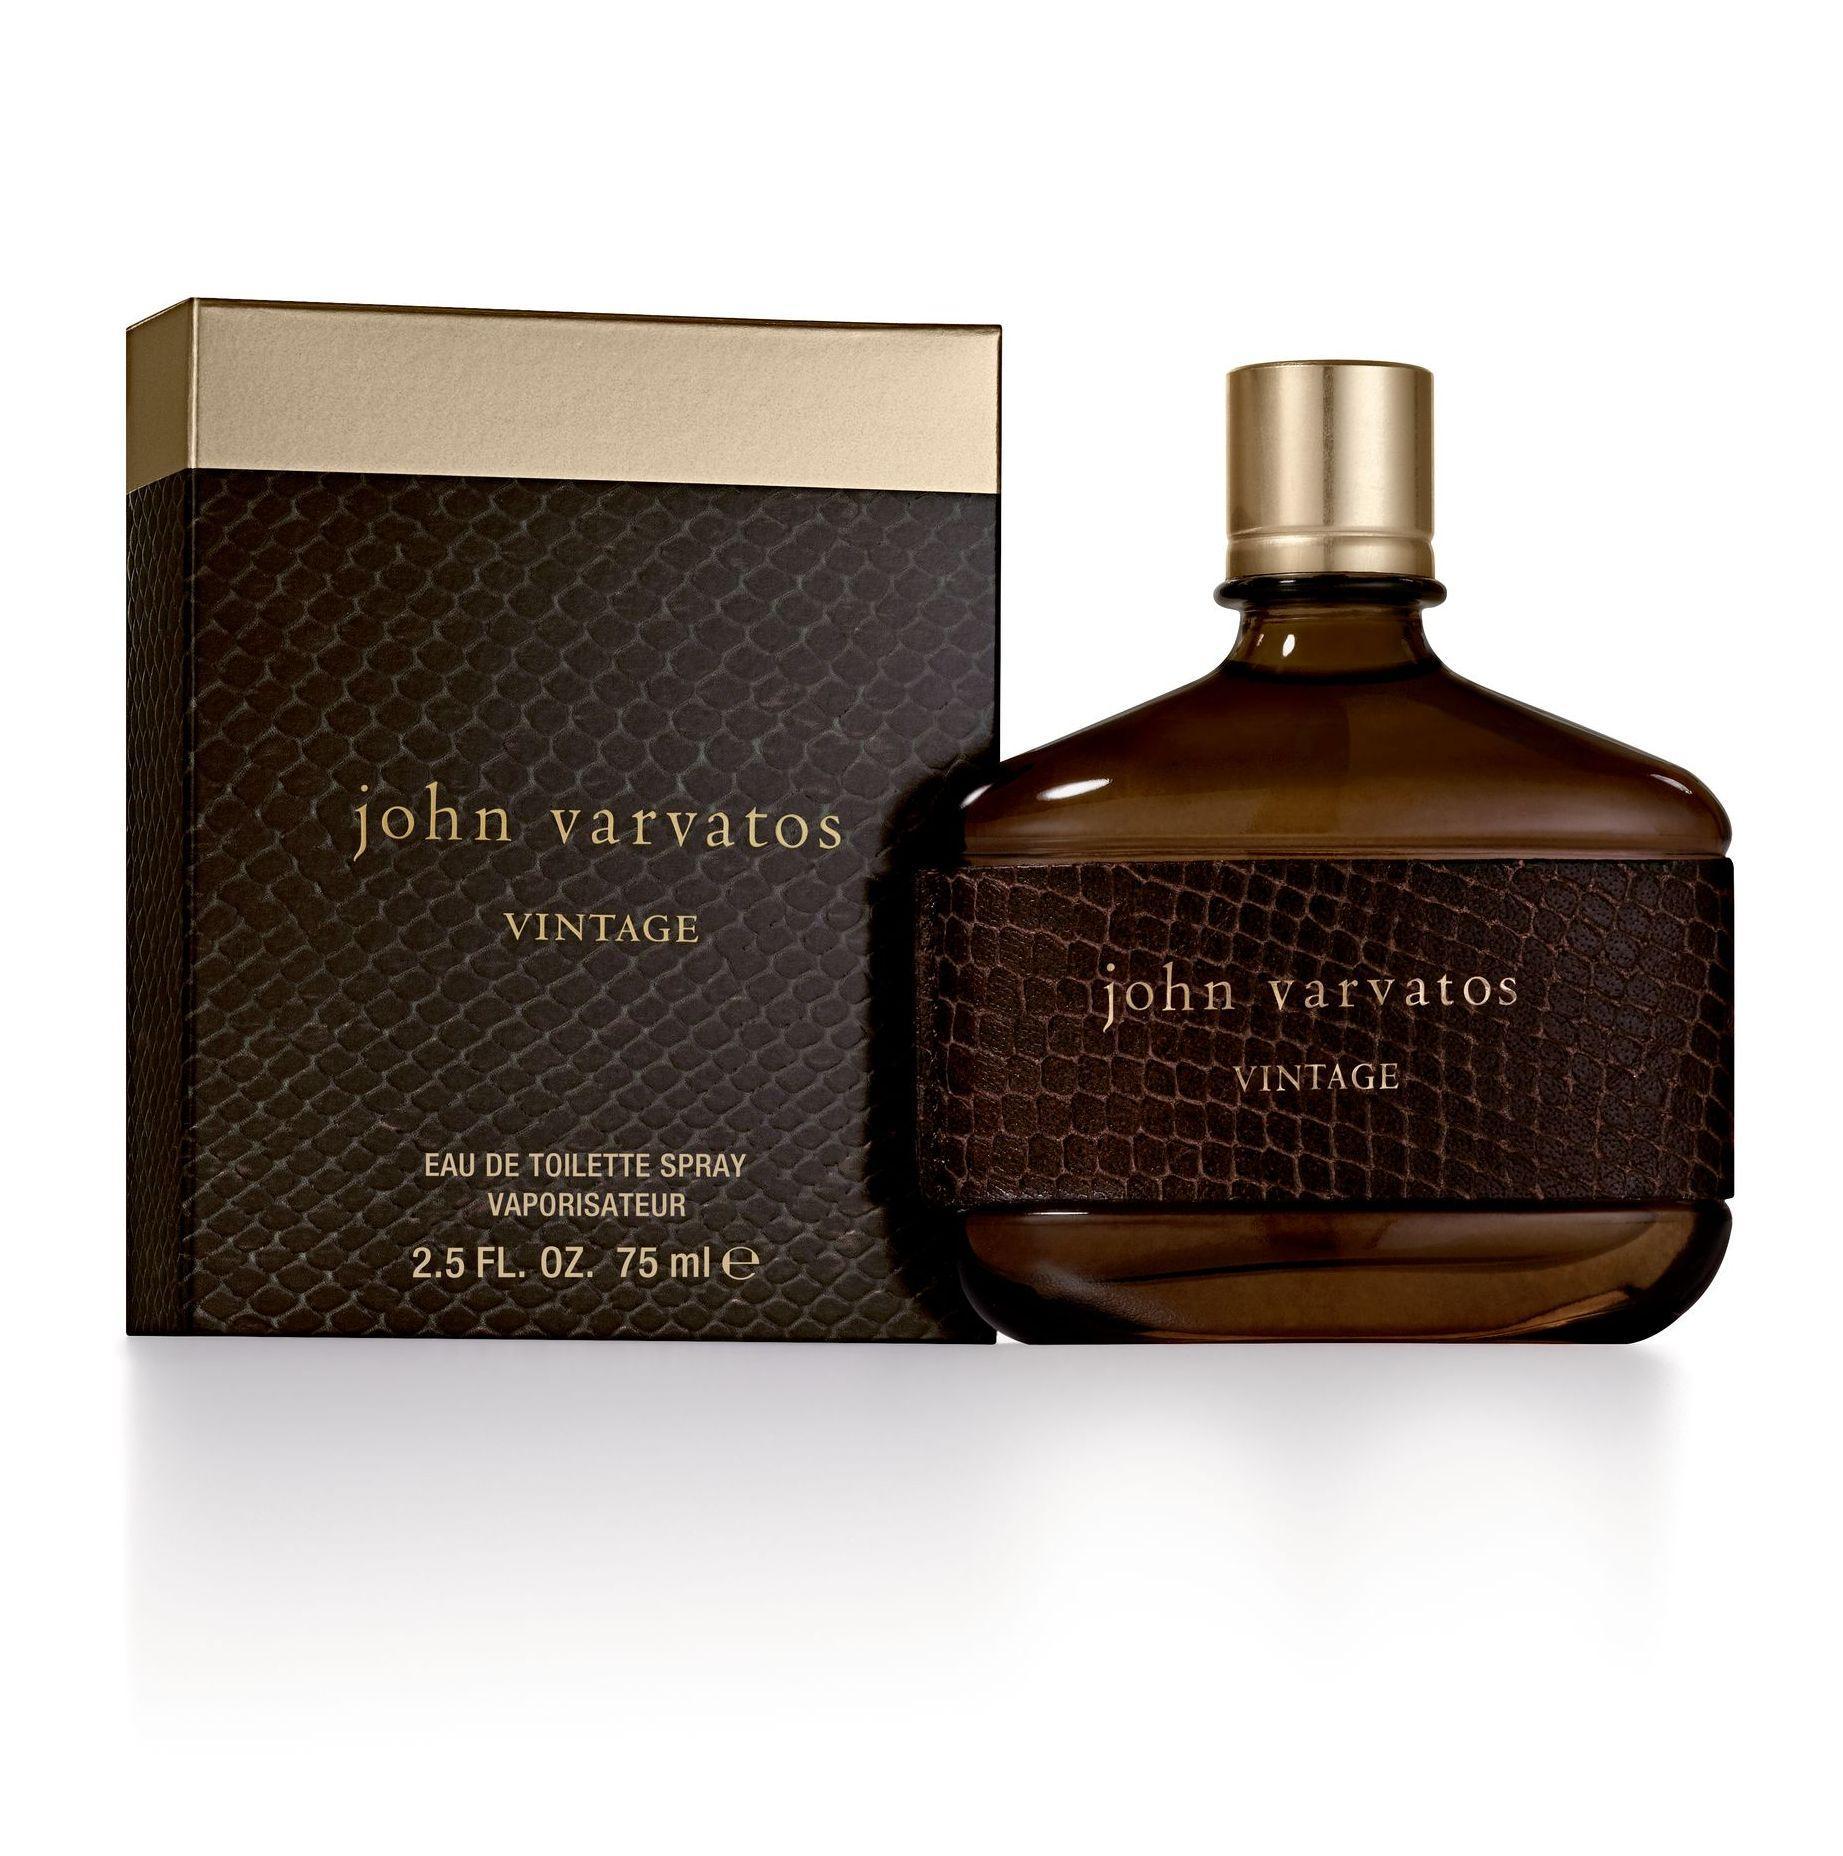 Amazon.com: John Varvatos Vintage Eau de Toilette Spray, 2.5 fl ...